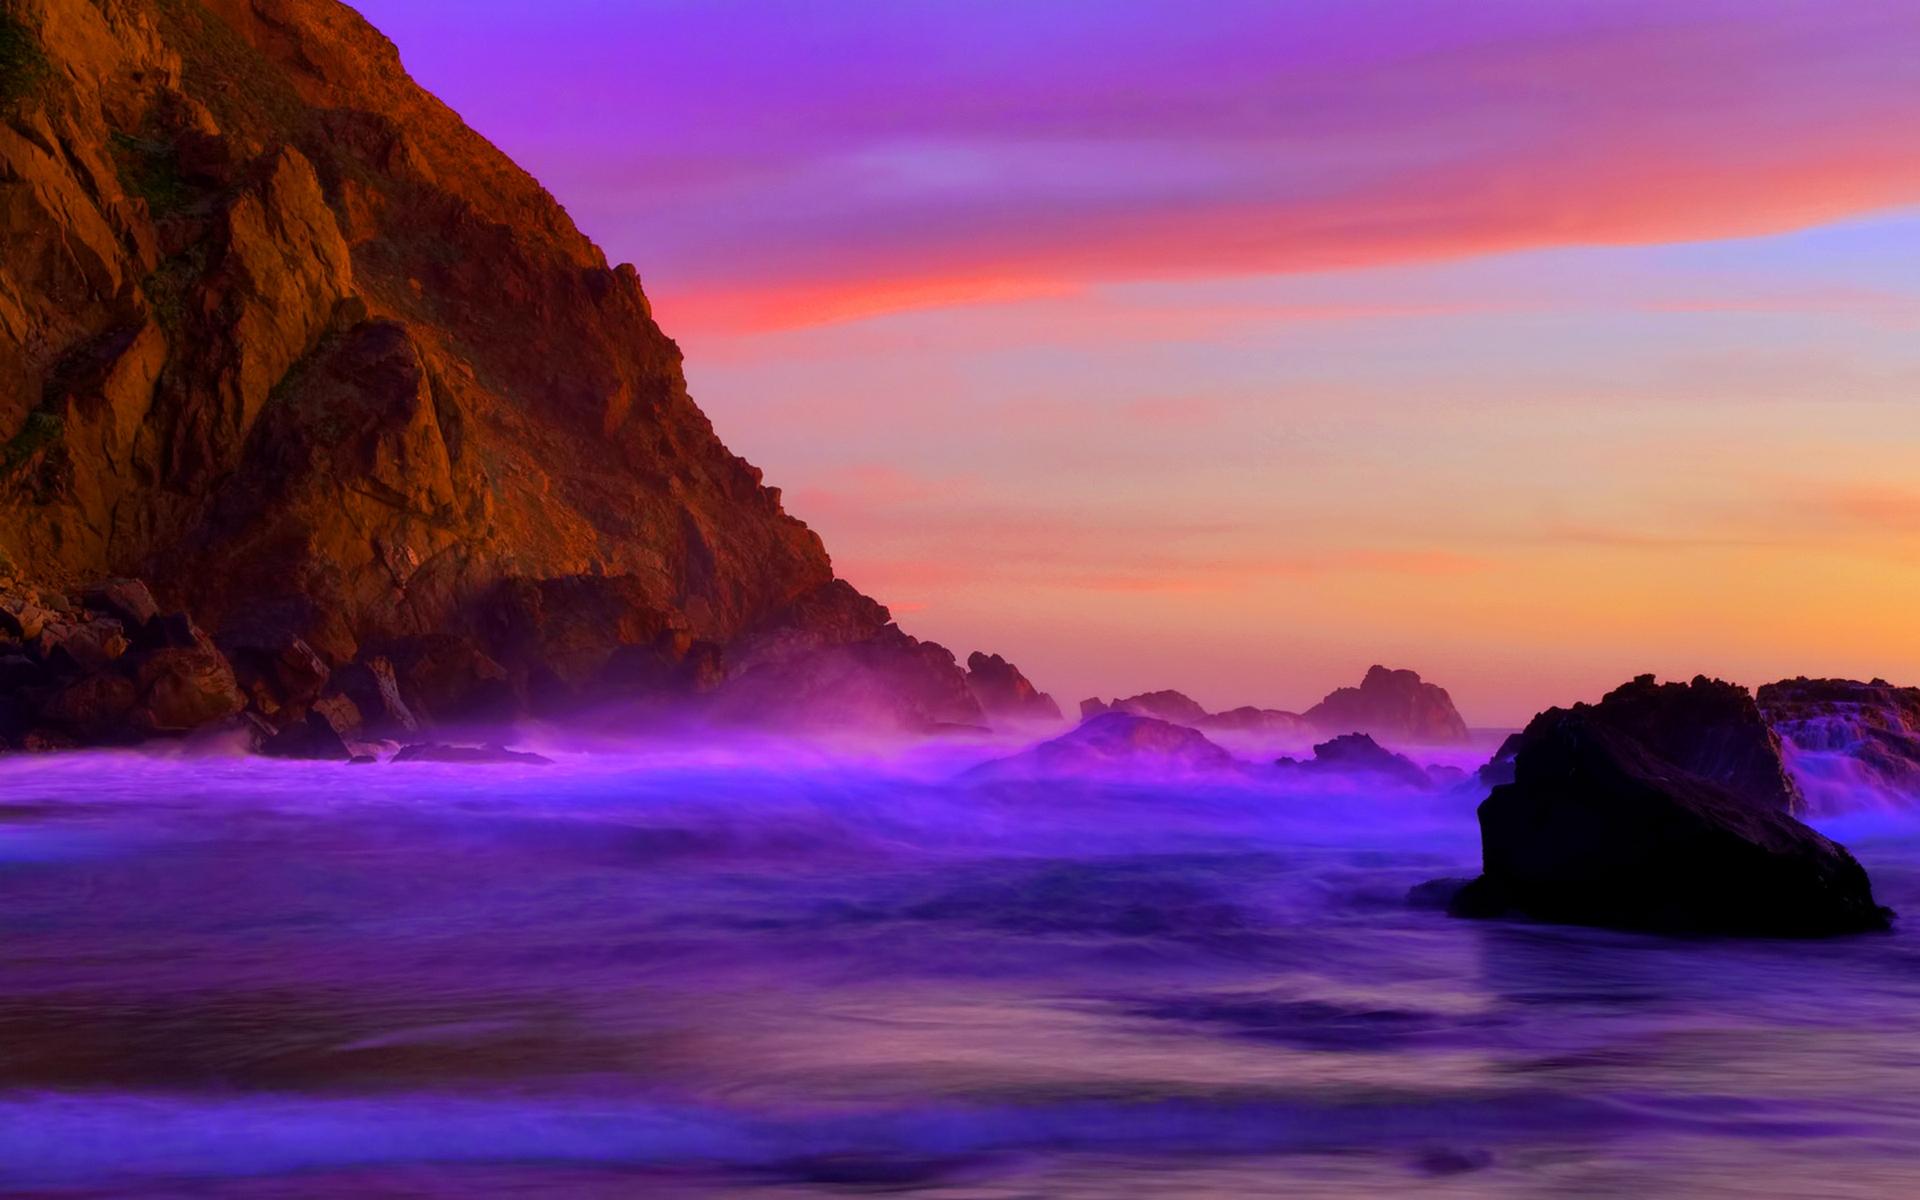 edge wallpaper hd,sky,nature,body of water,sea,natural landscape